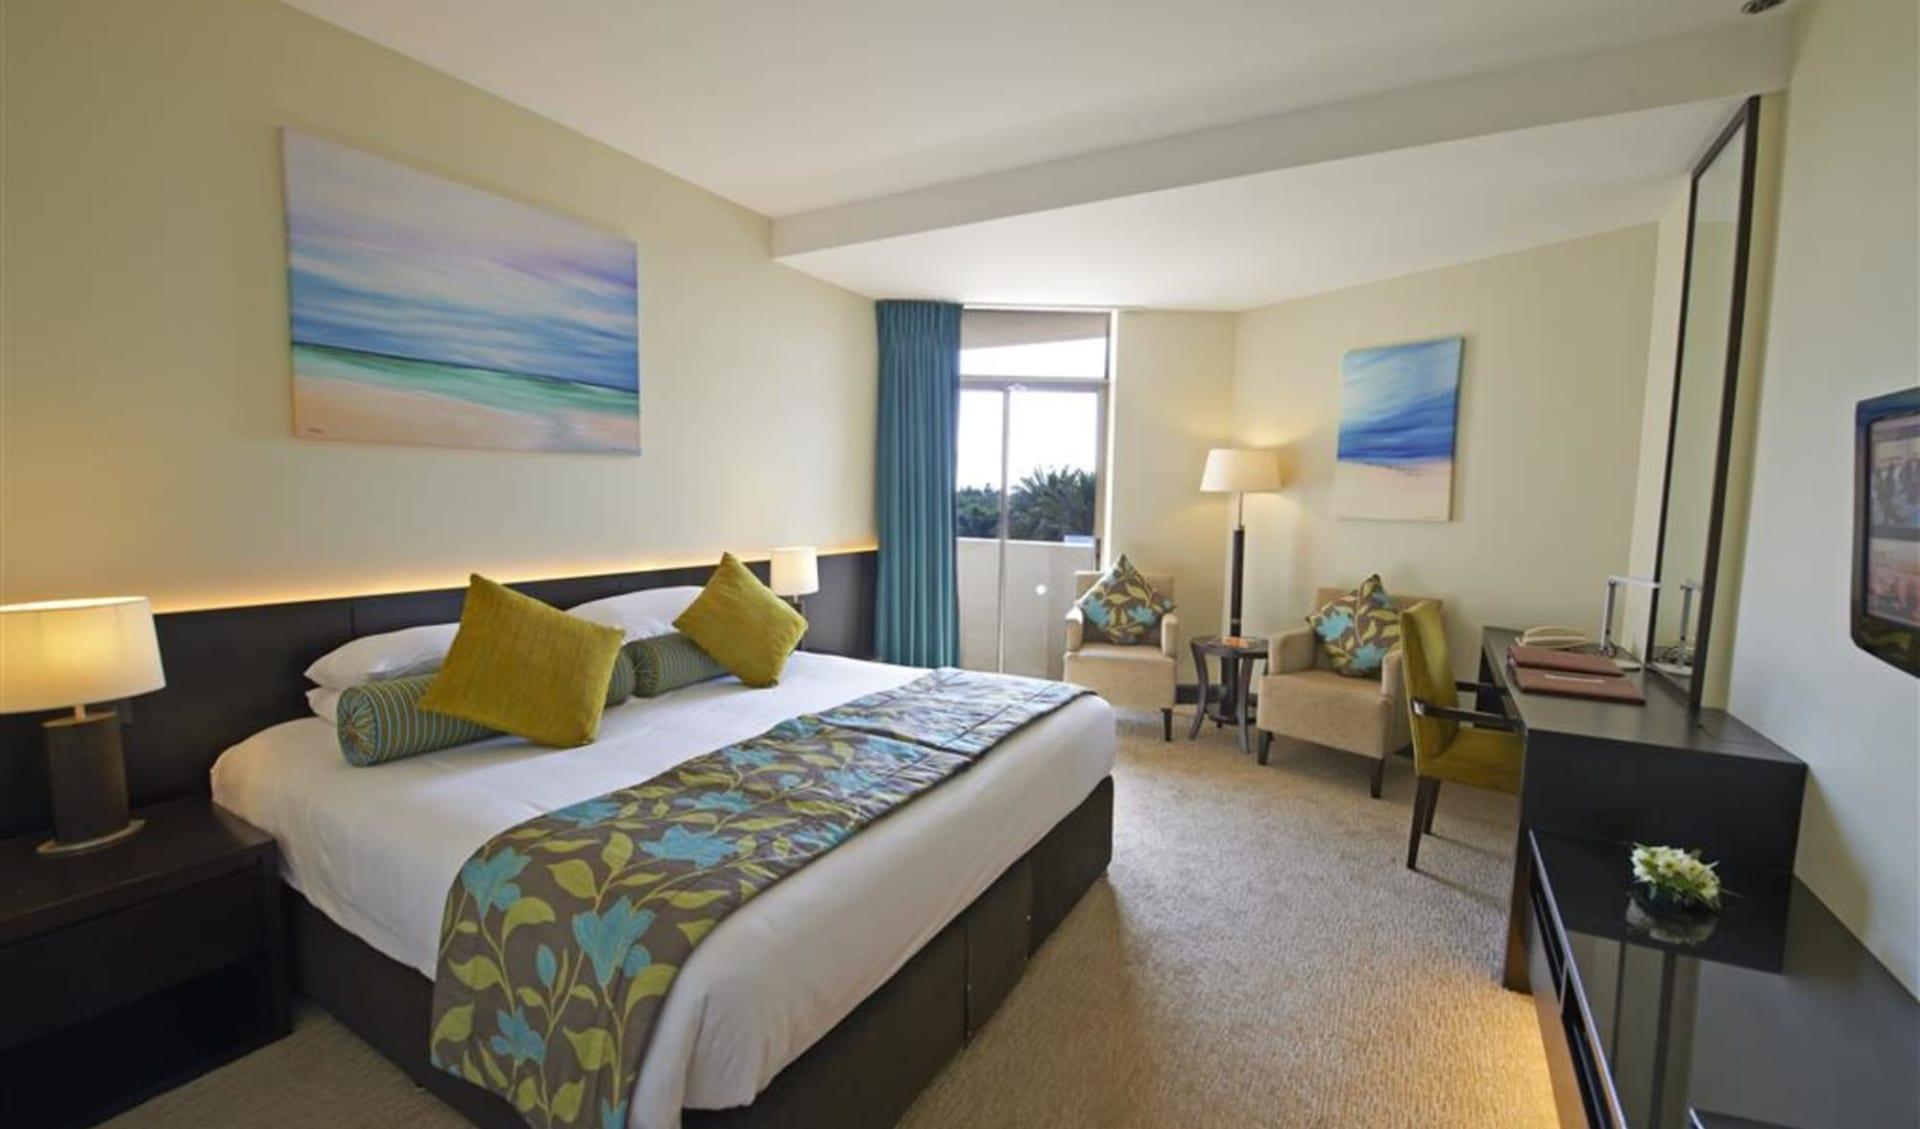 JA Beach Hotel in Dubai:  Standard Garden View